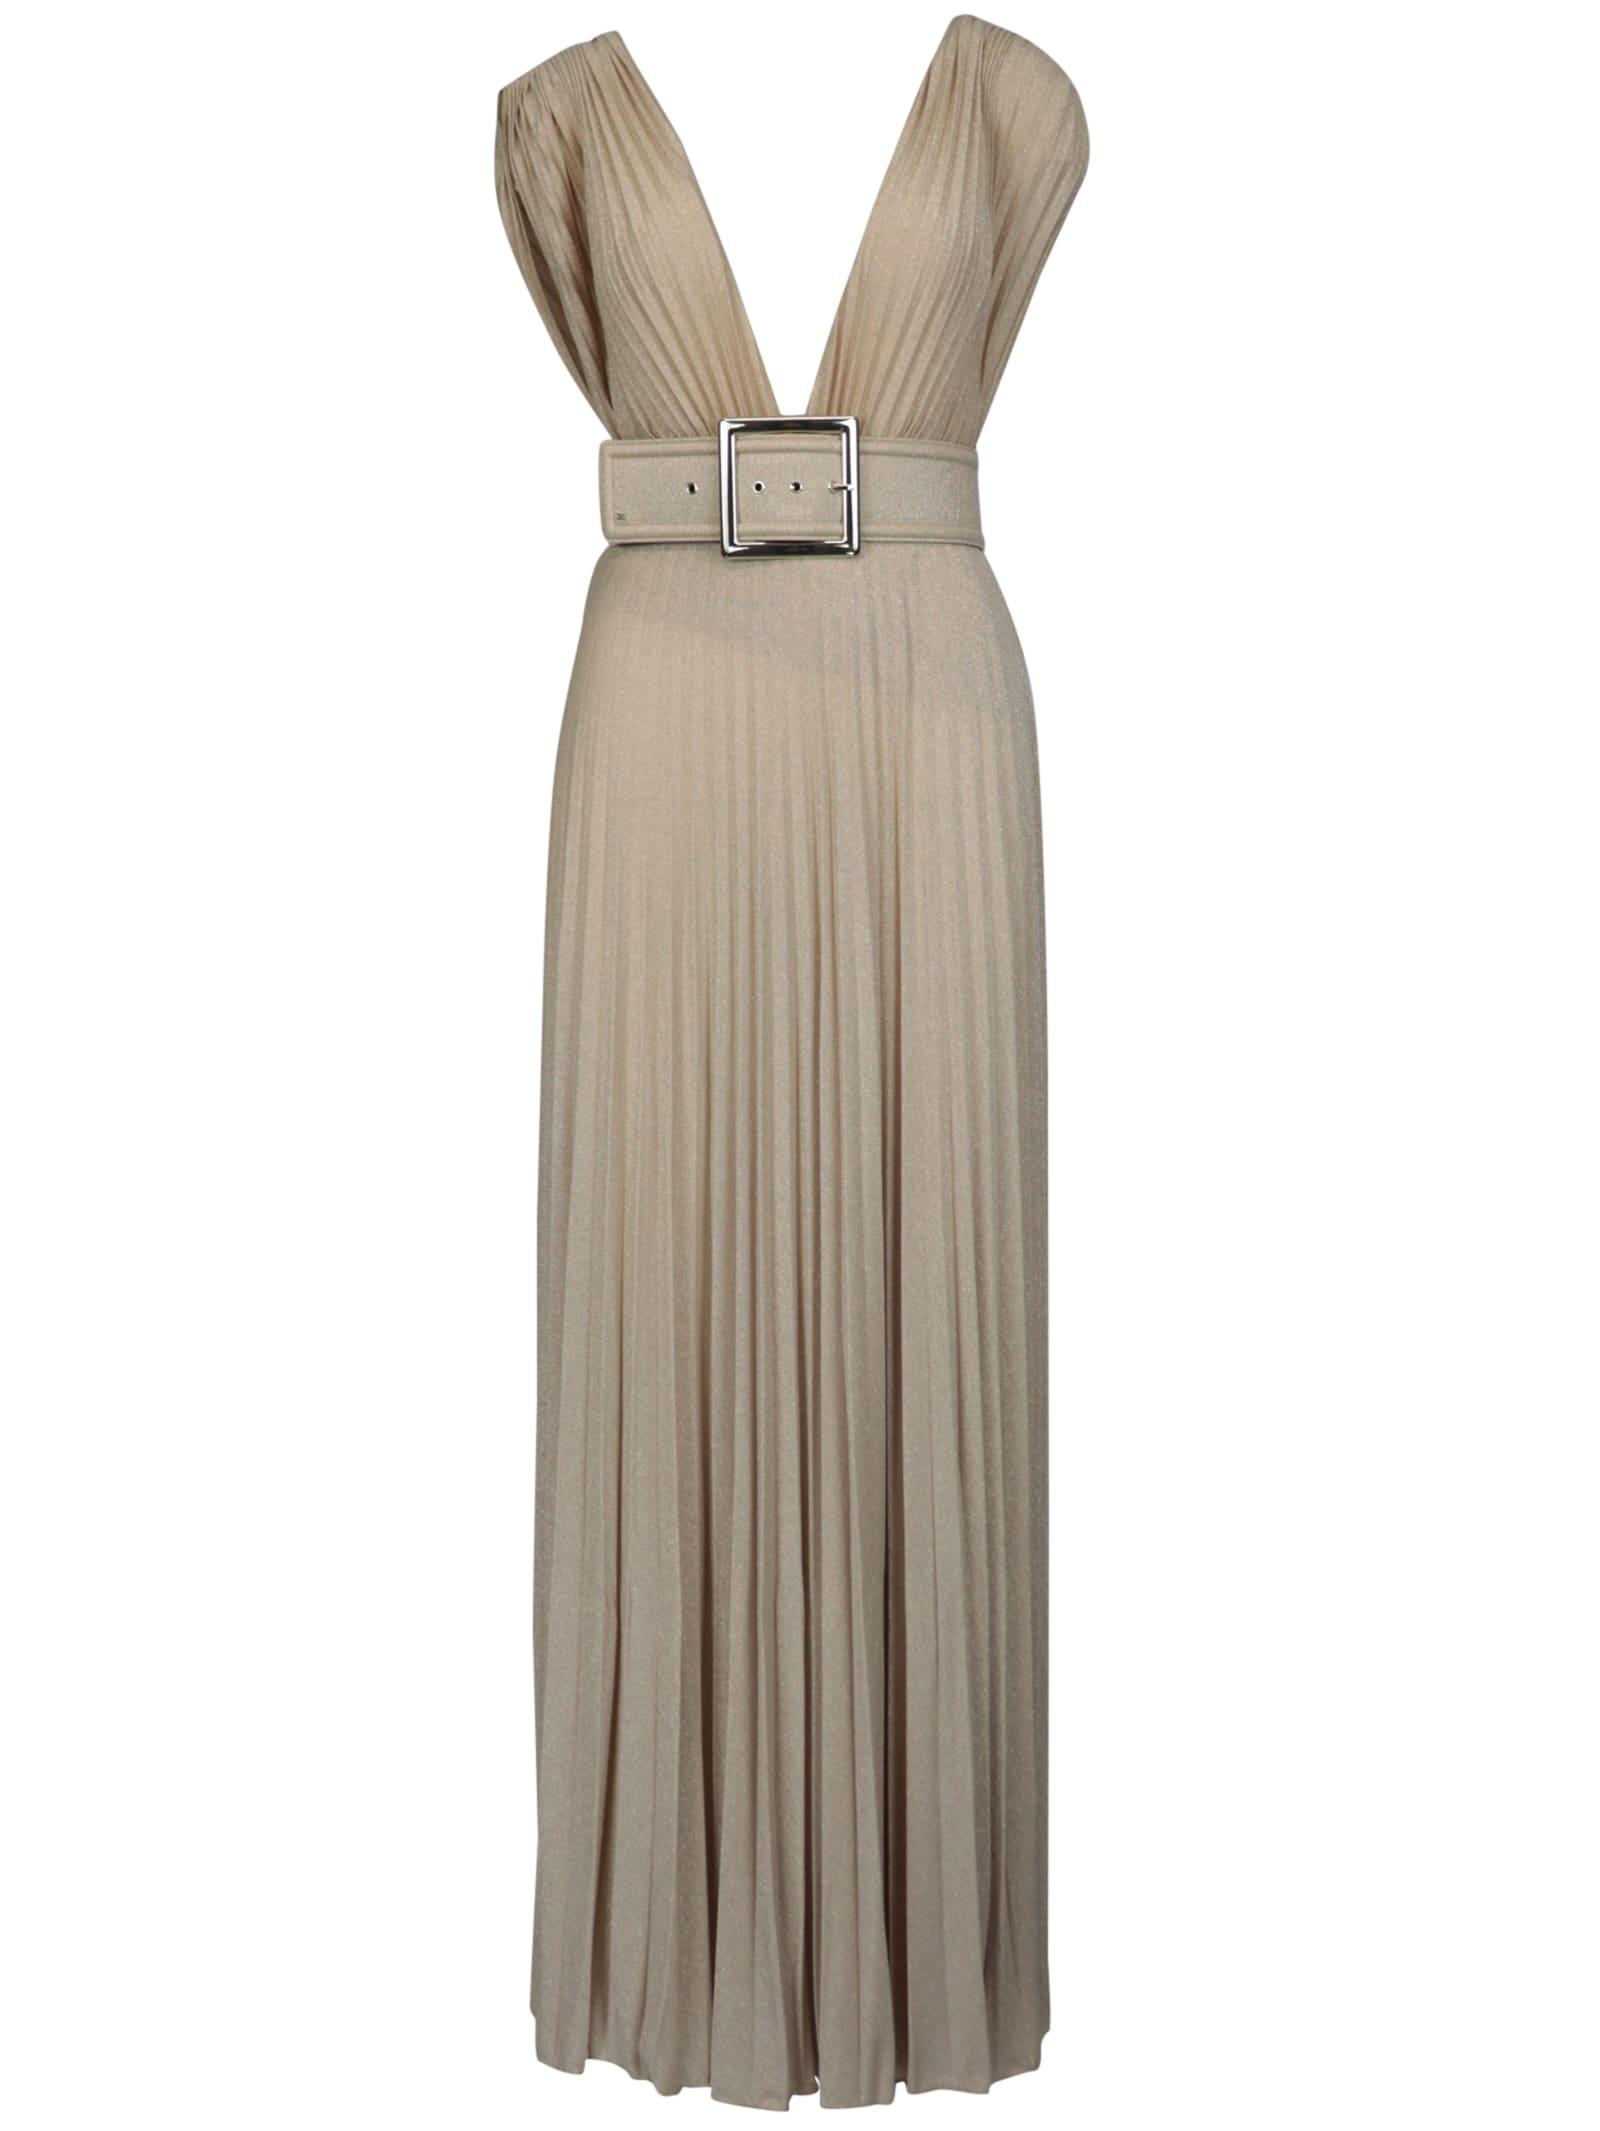 Buy Elisabetta Franchi Celyn B. Jersey Long With Belt Dress online, shop Elisabetta Franchi Celyn B. with free shipping